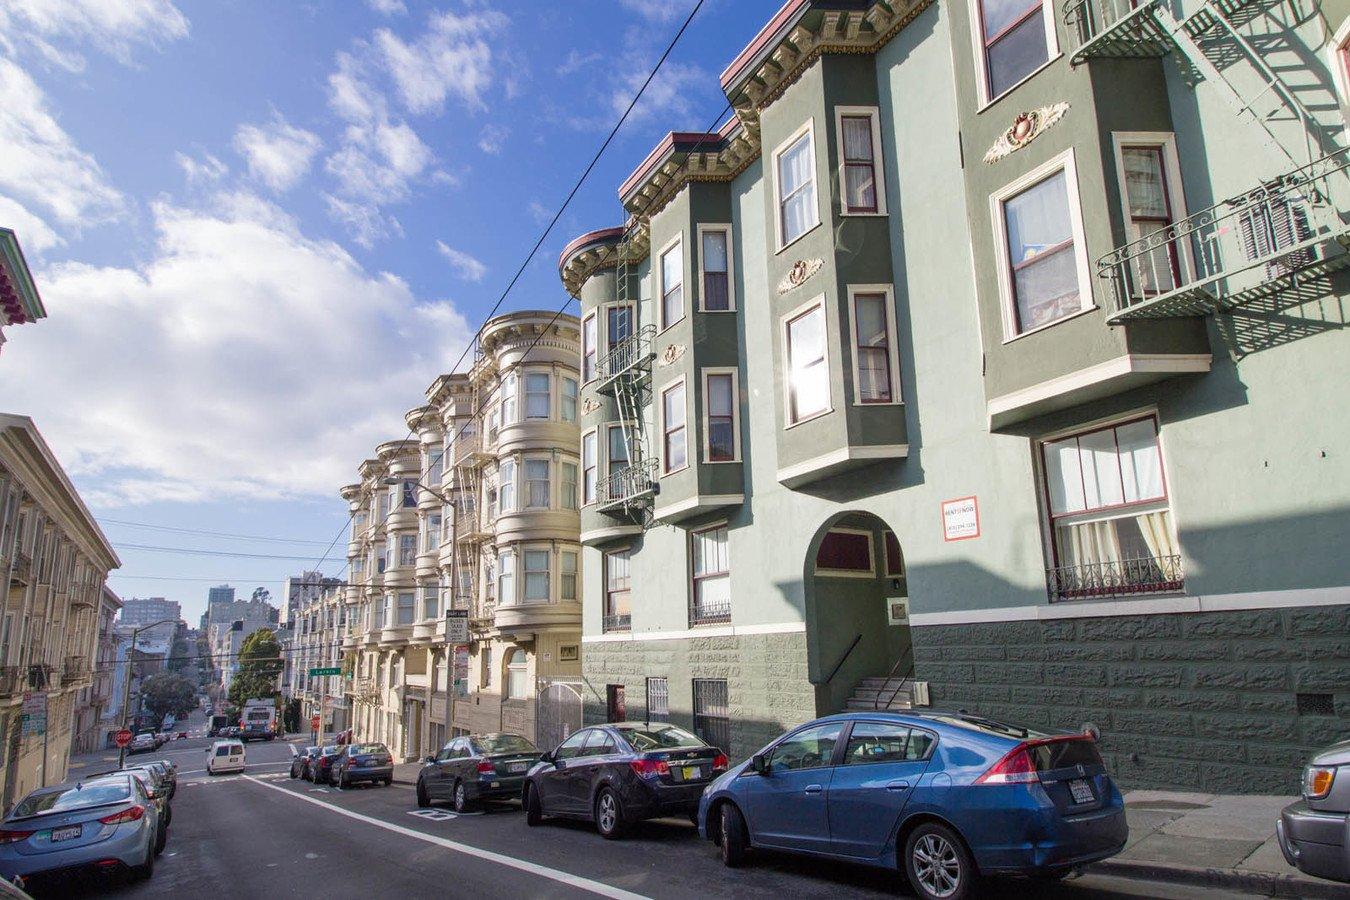 1 Bedroom 1 Bathroom Apartment for rent at 1560 Sacramento Apartments & Suites in San Francisco, CA